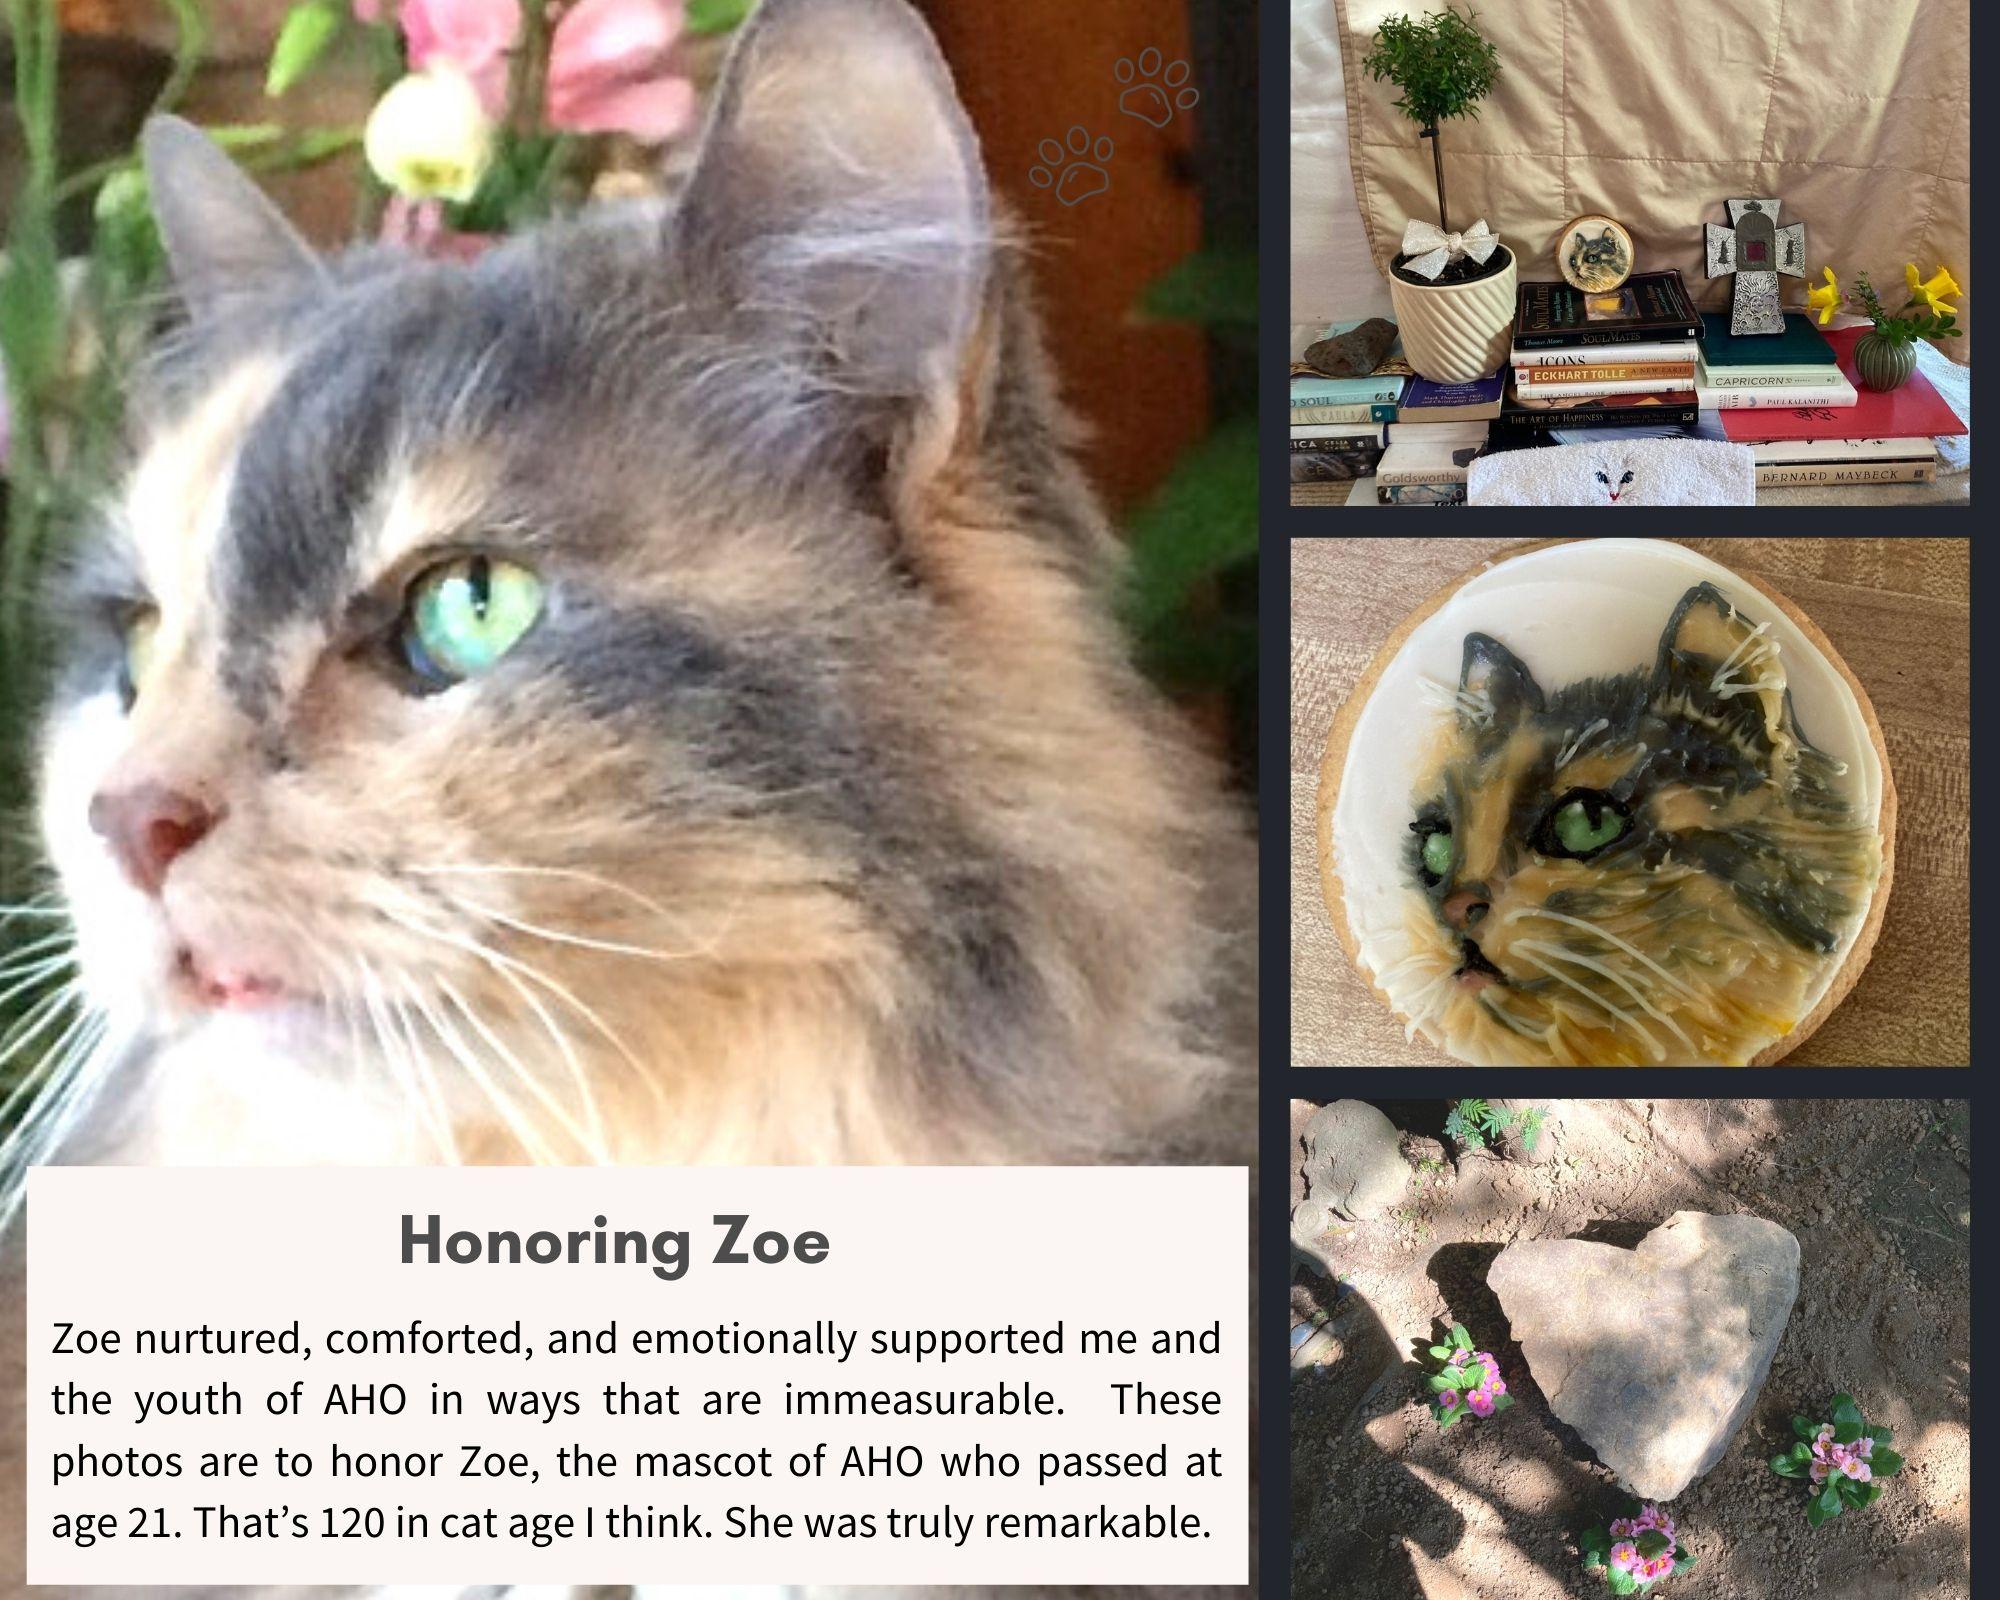 honoring zoe